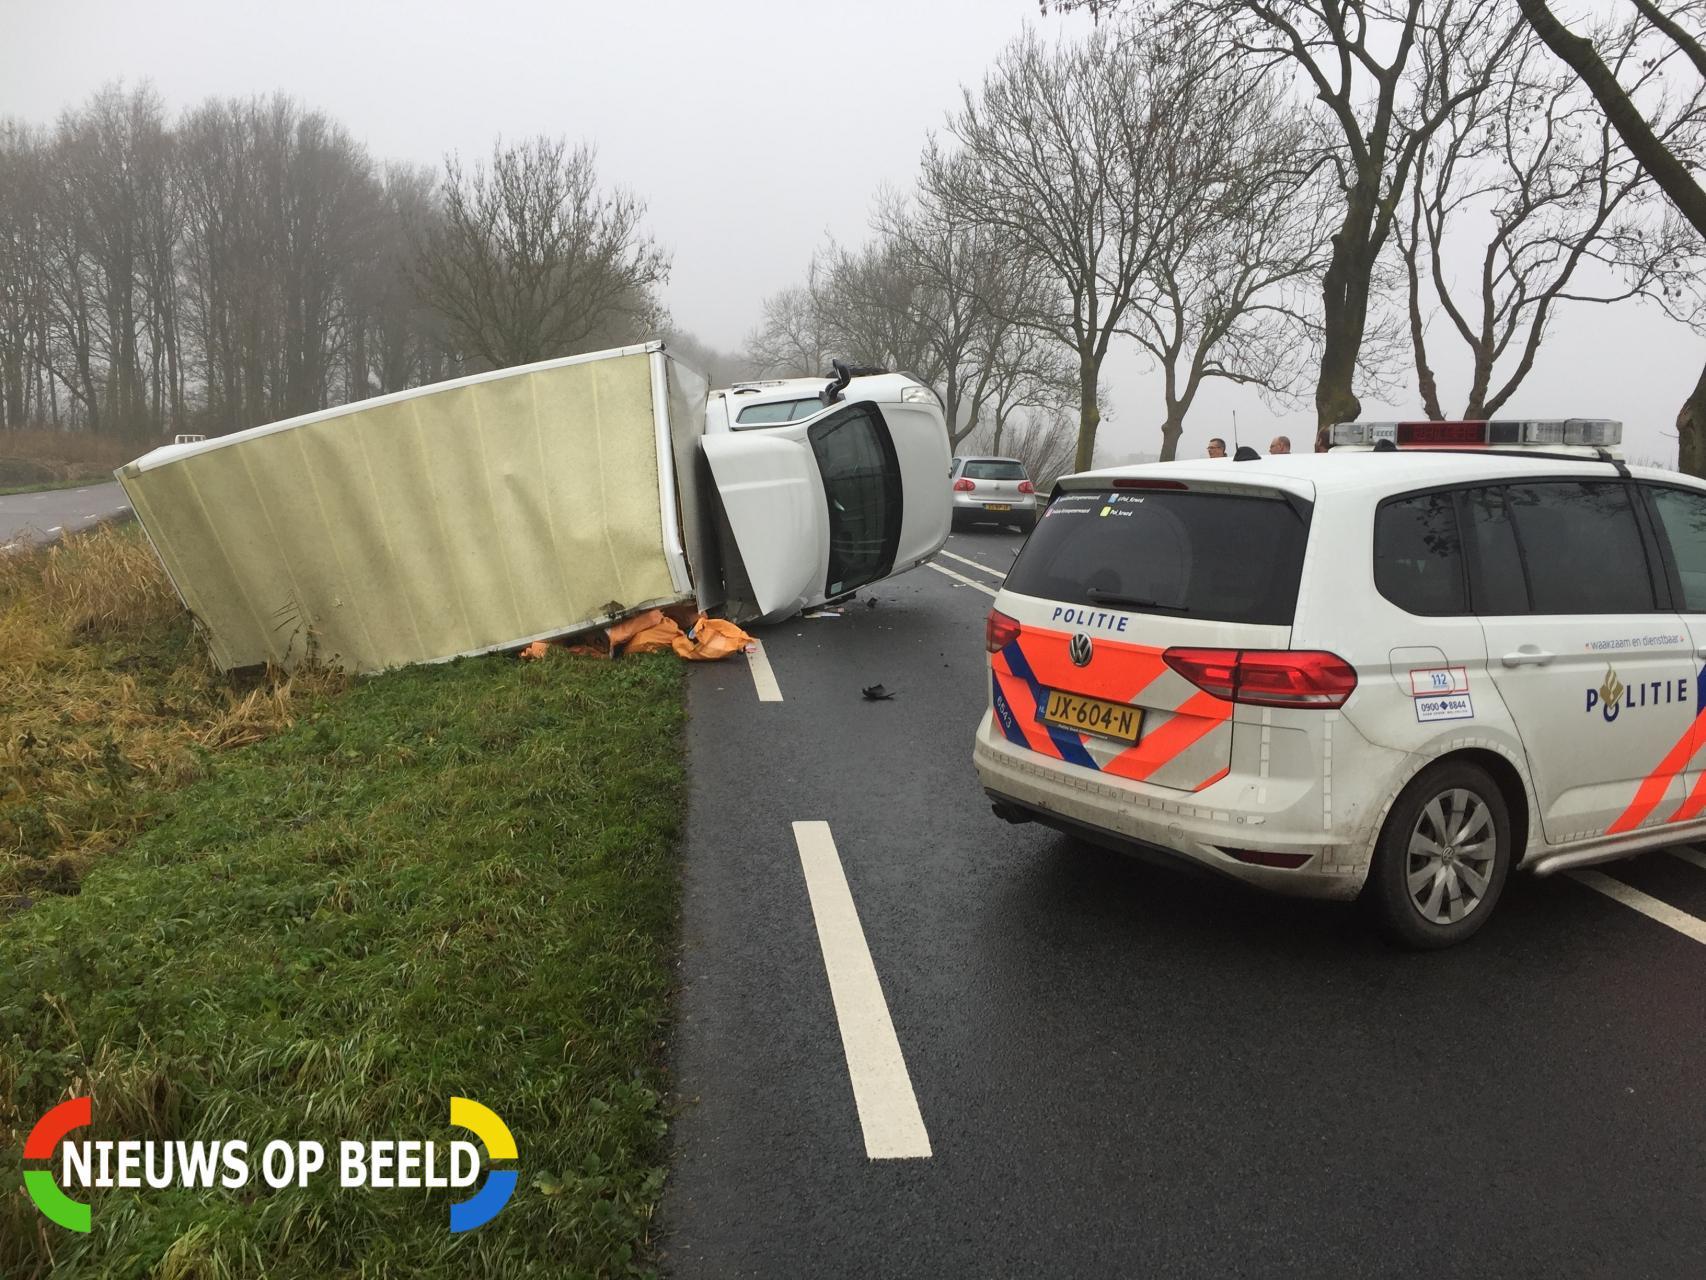 Ravage na ongeval met auto en bestelbus Schoonhovenseweg N207 Stolwijk